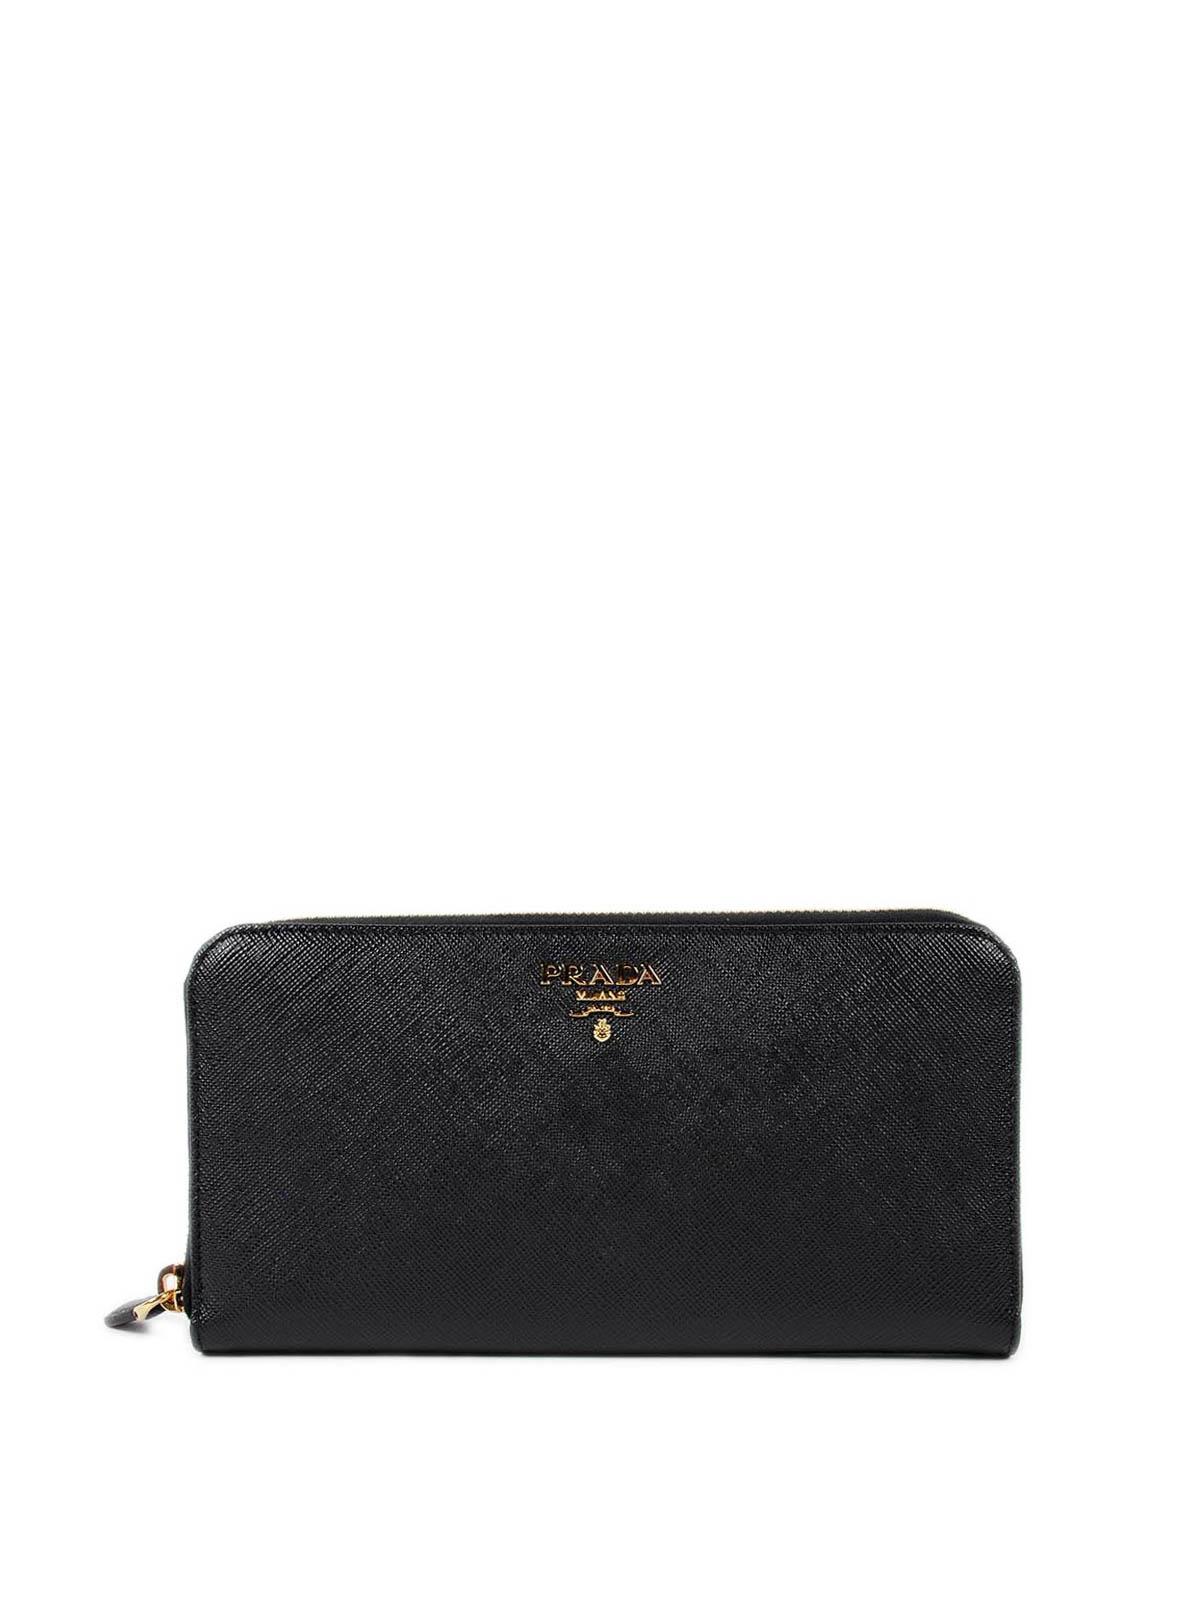 2b4474e6664e Prada - Saffiano leather zip around wallet - wallets & purses ...